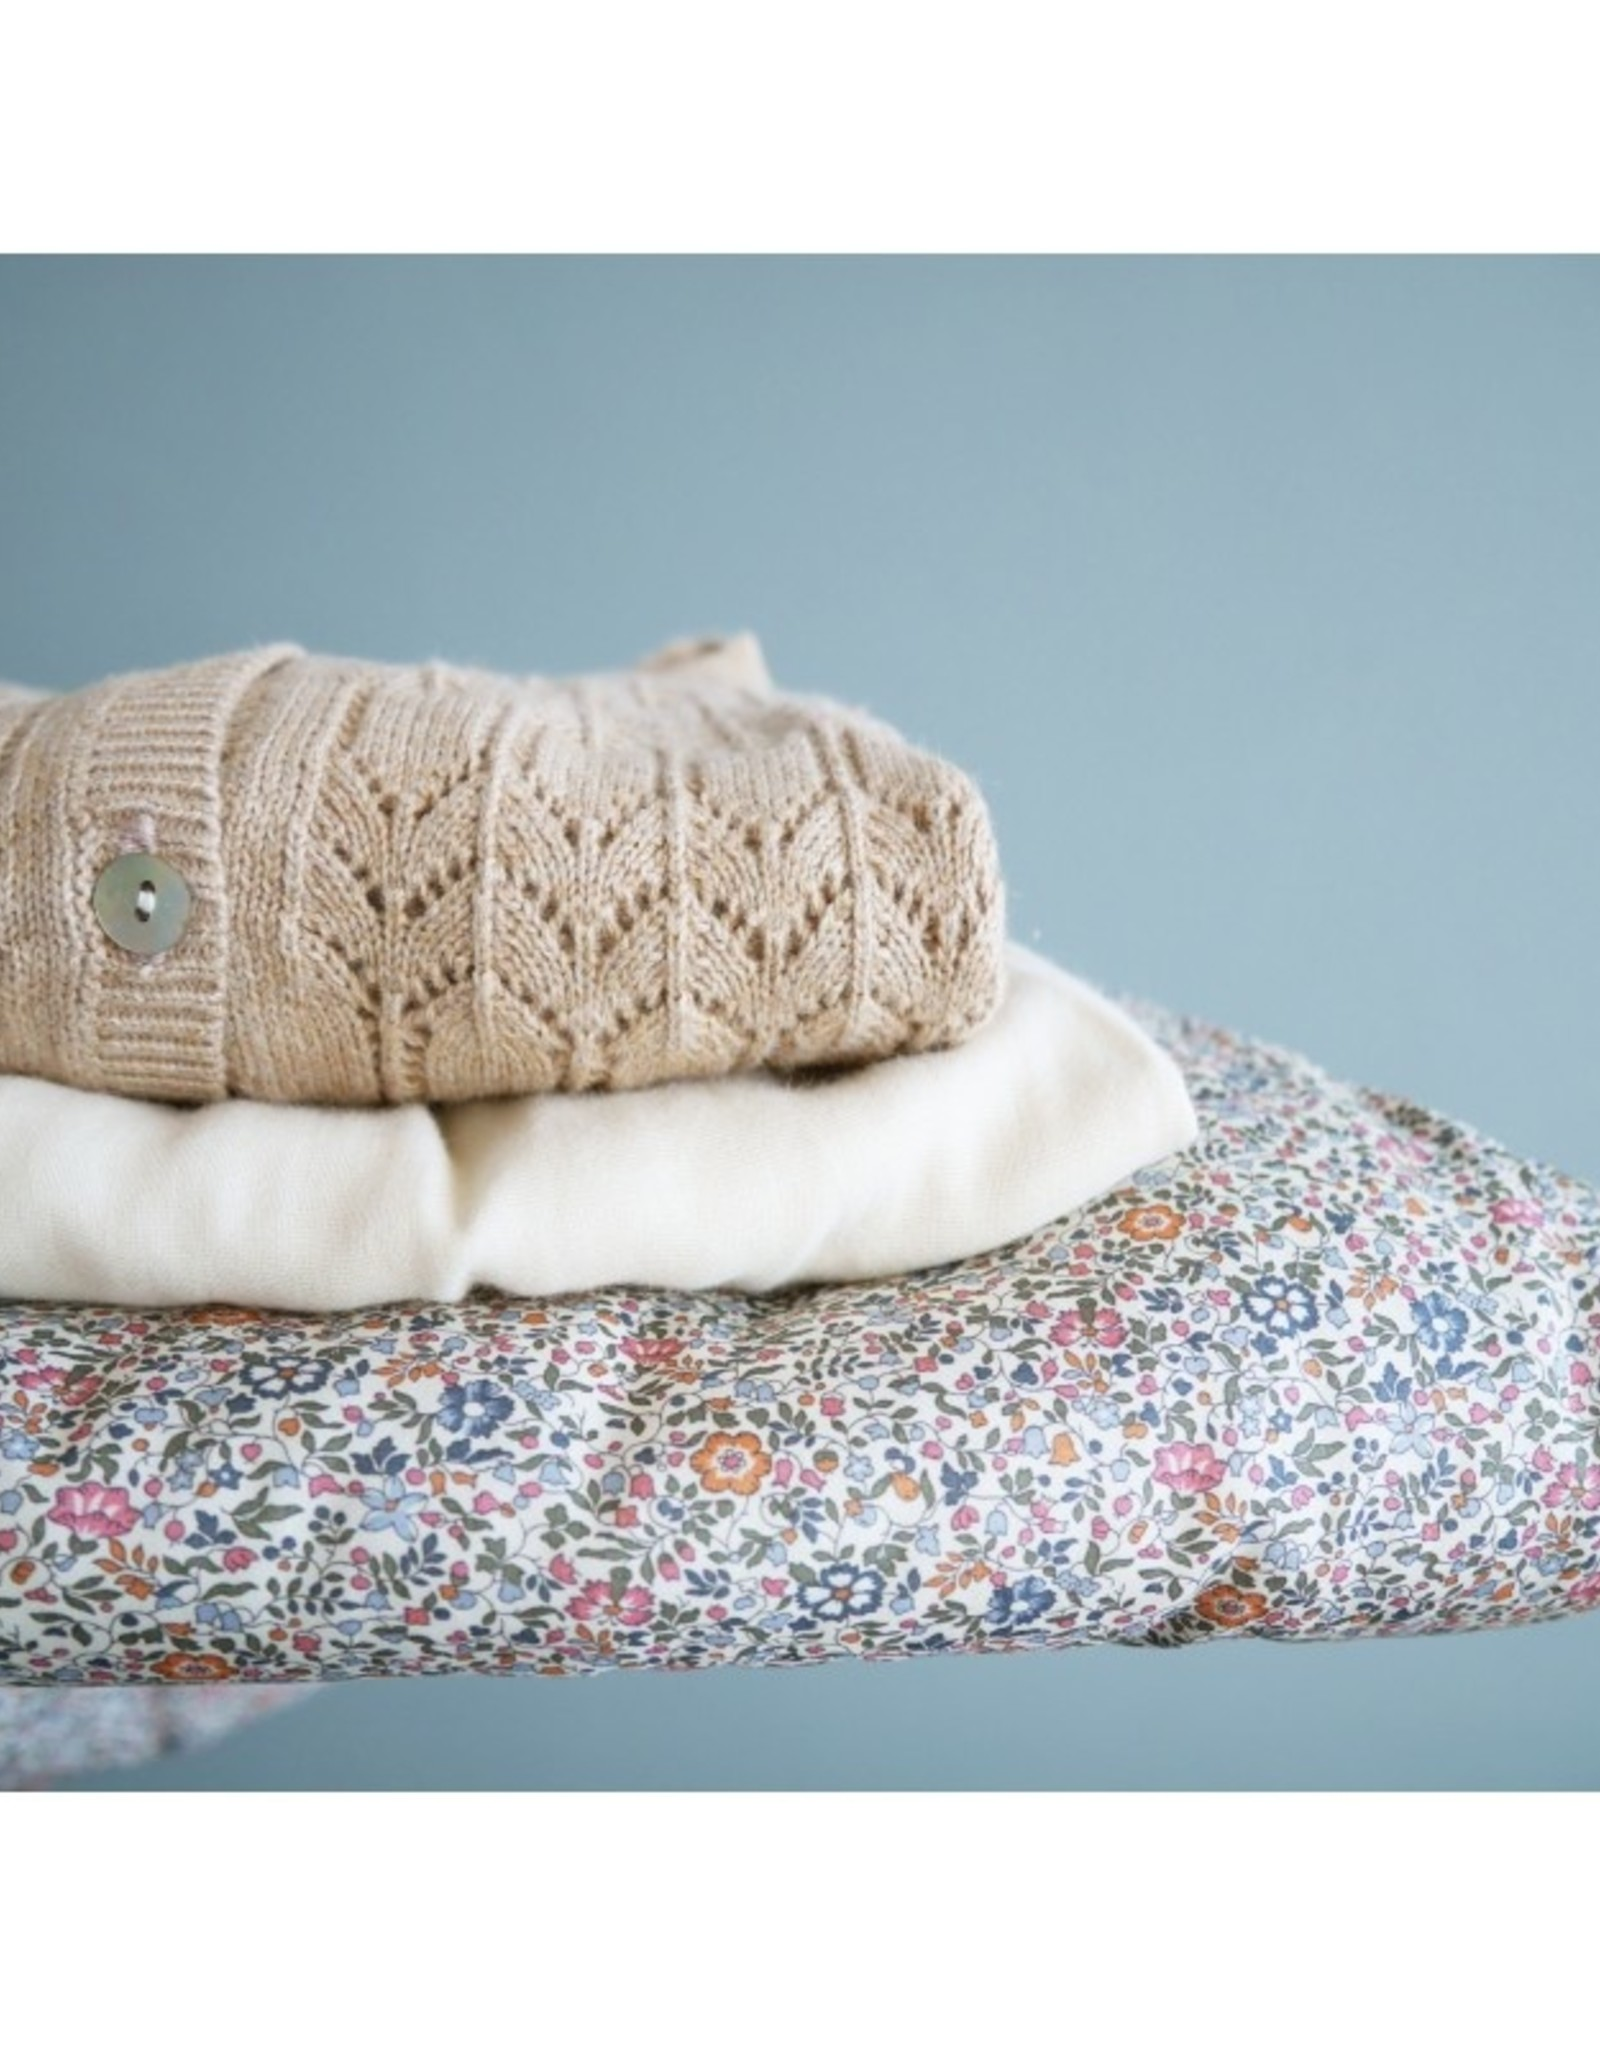 La Petite Collection Katie & Millie Sleeping Bag